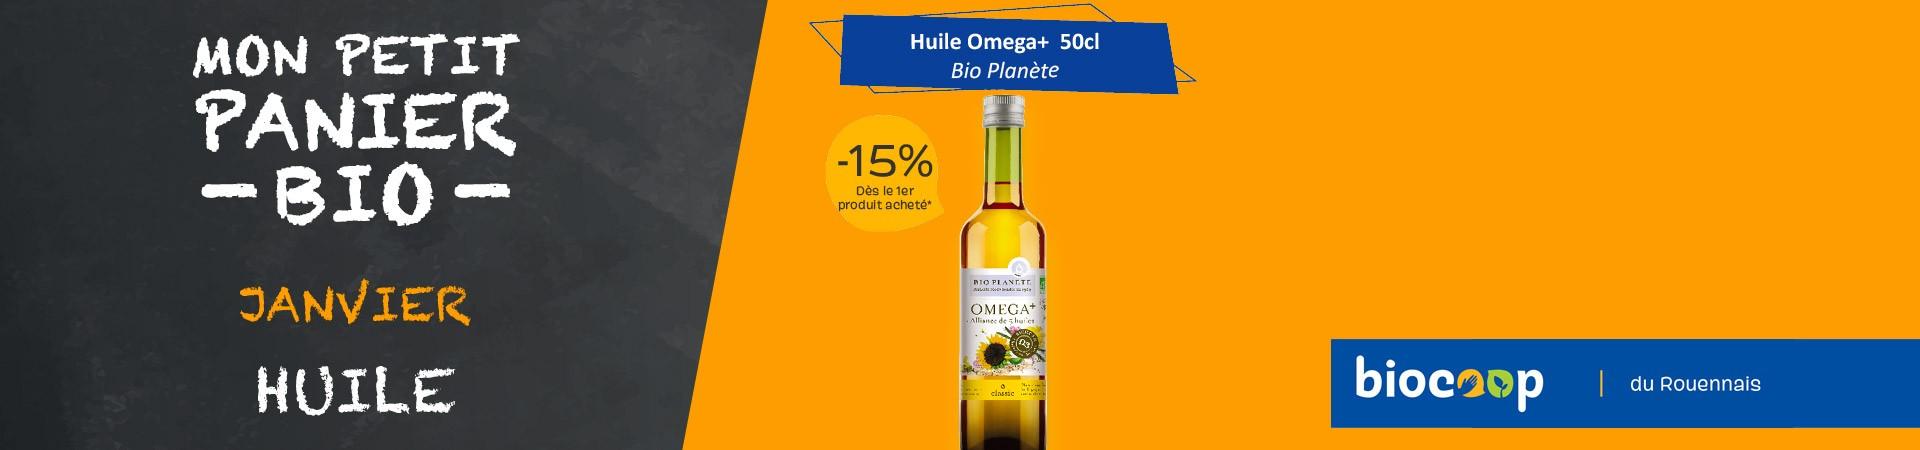 Huile Omega+ Bio Planete